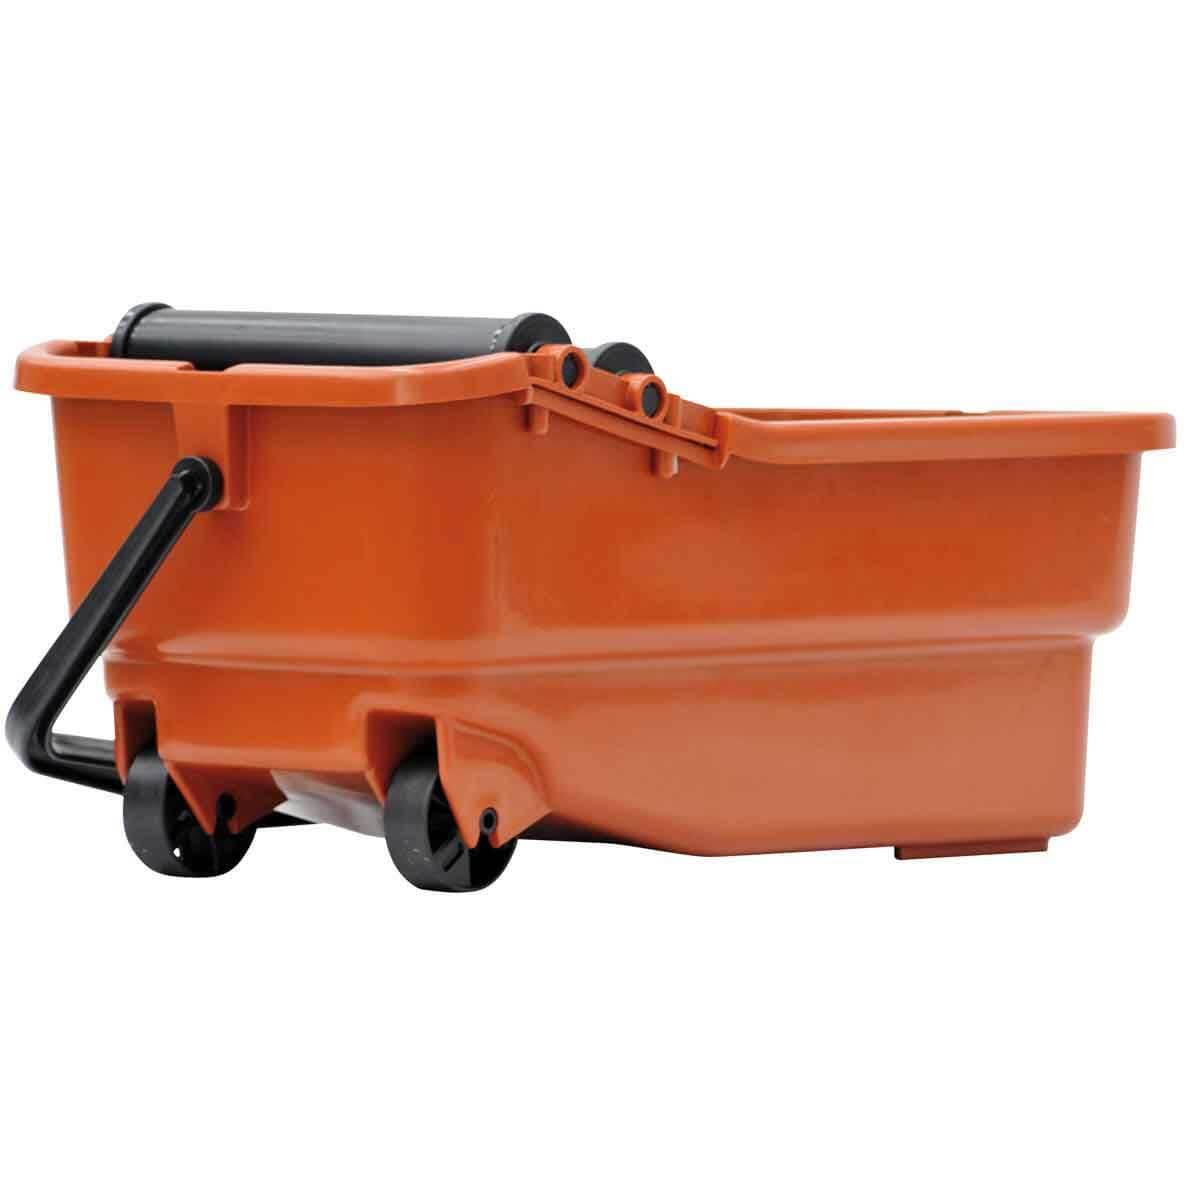 Raimondi Smart rinse bucket side